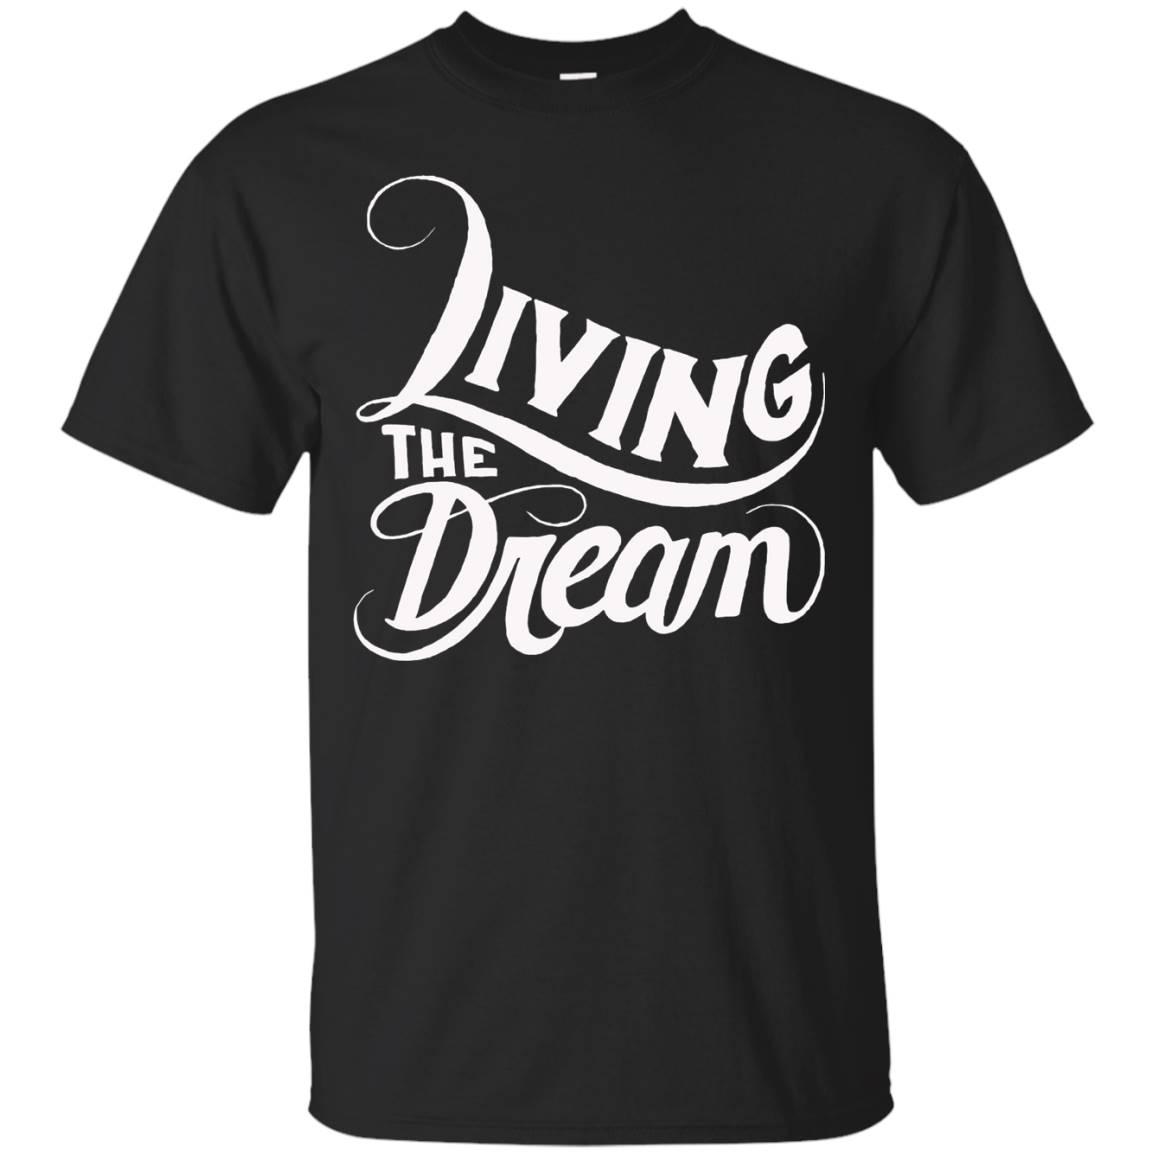 Living The Dream – Inspirational Motivational T Shirt